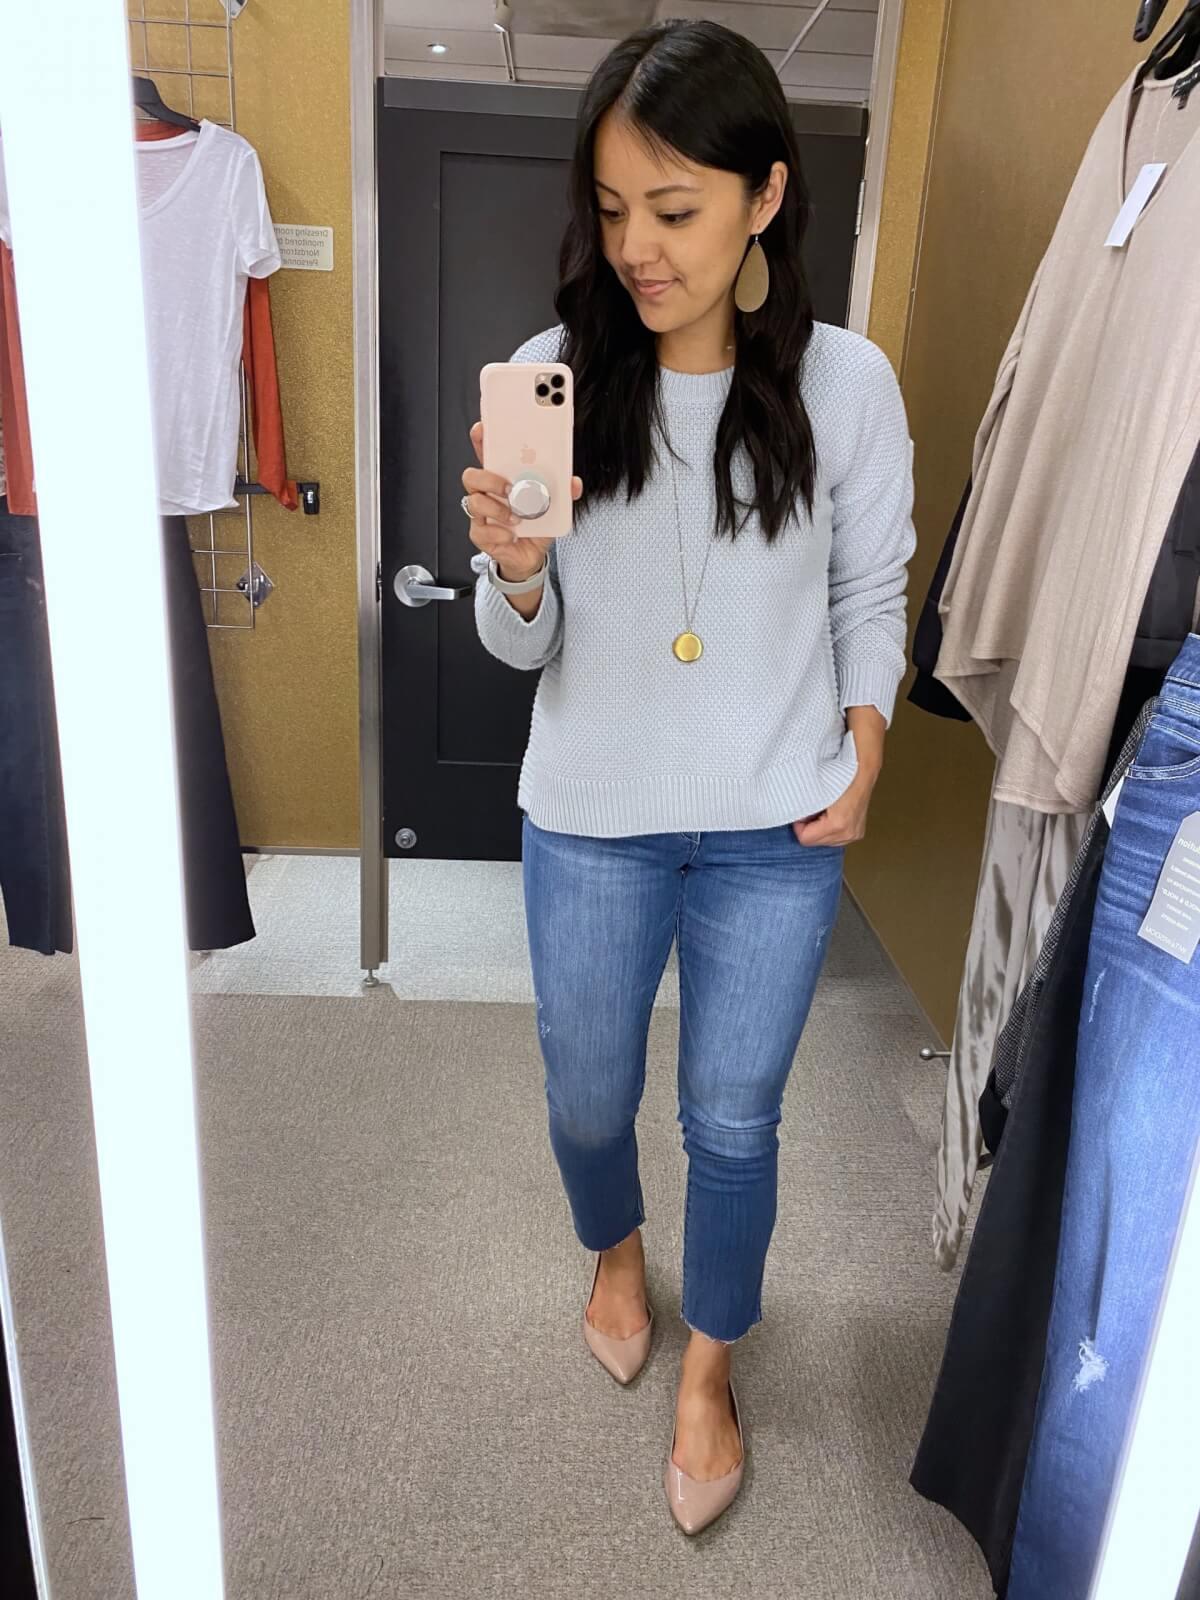 light blue sweater + light denim jeans + gold earrings + nude flats + gold pendant necklace